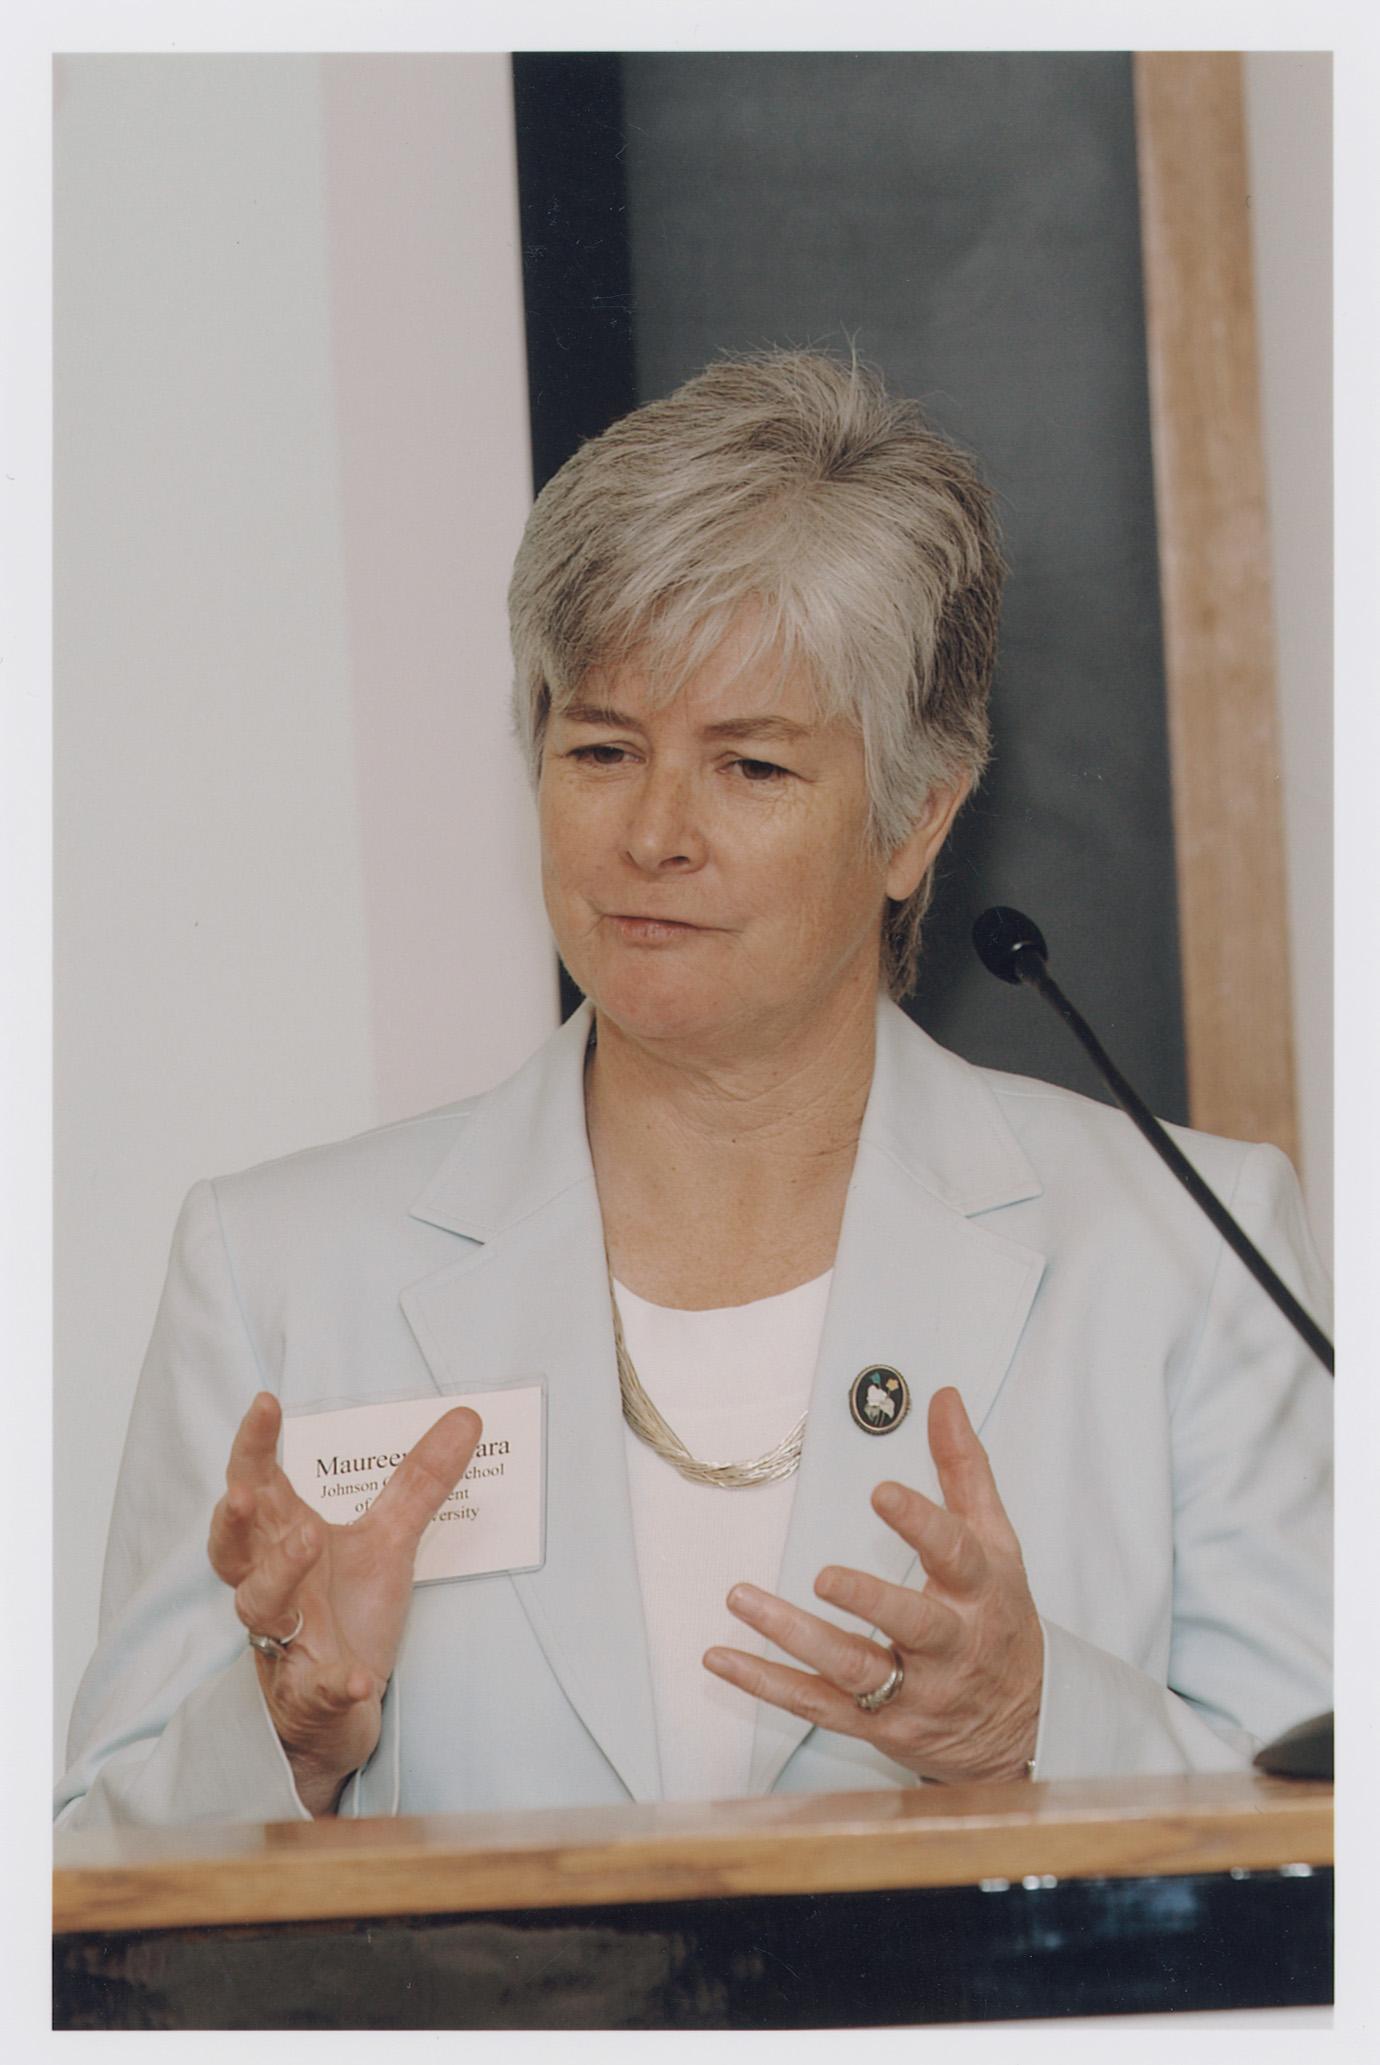 Cornell Mgmt. Prof. Maureen O'Hara